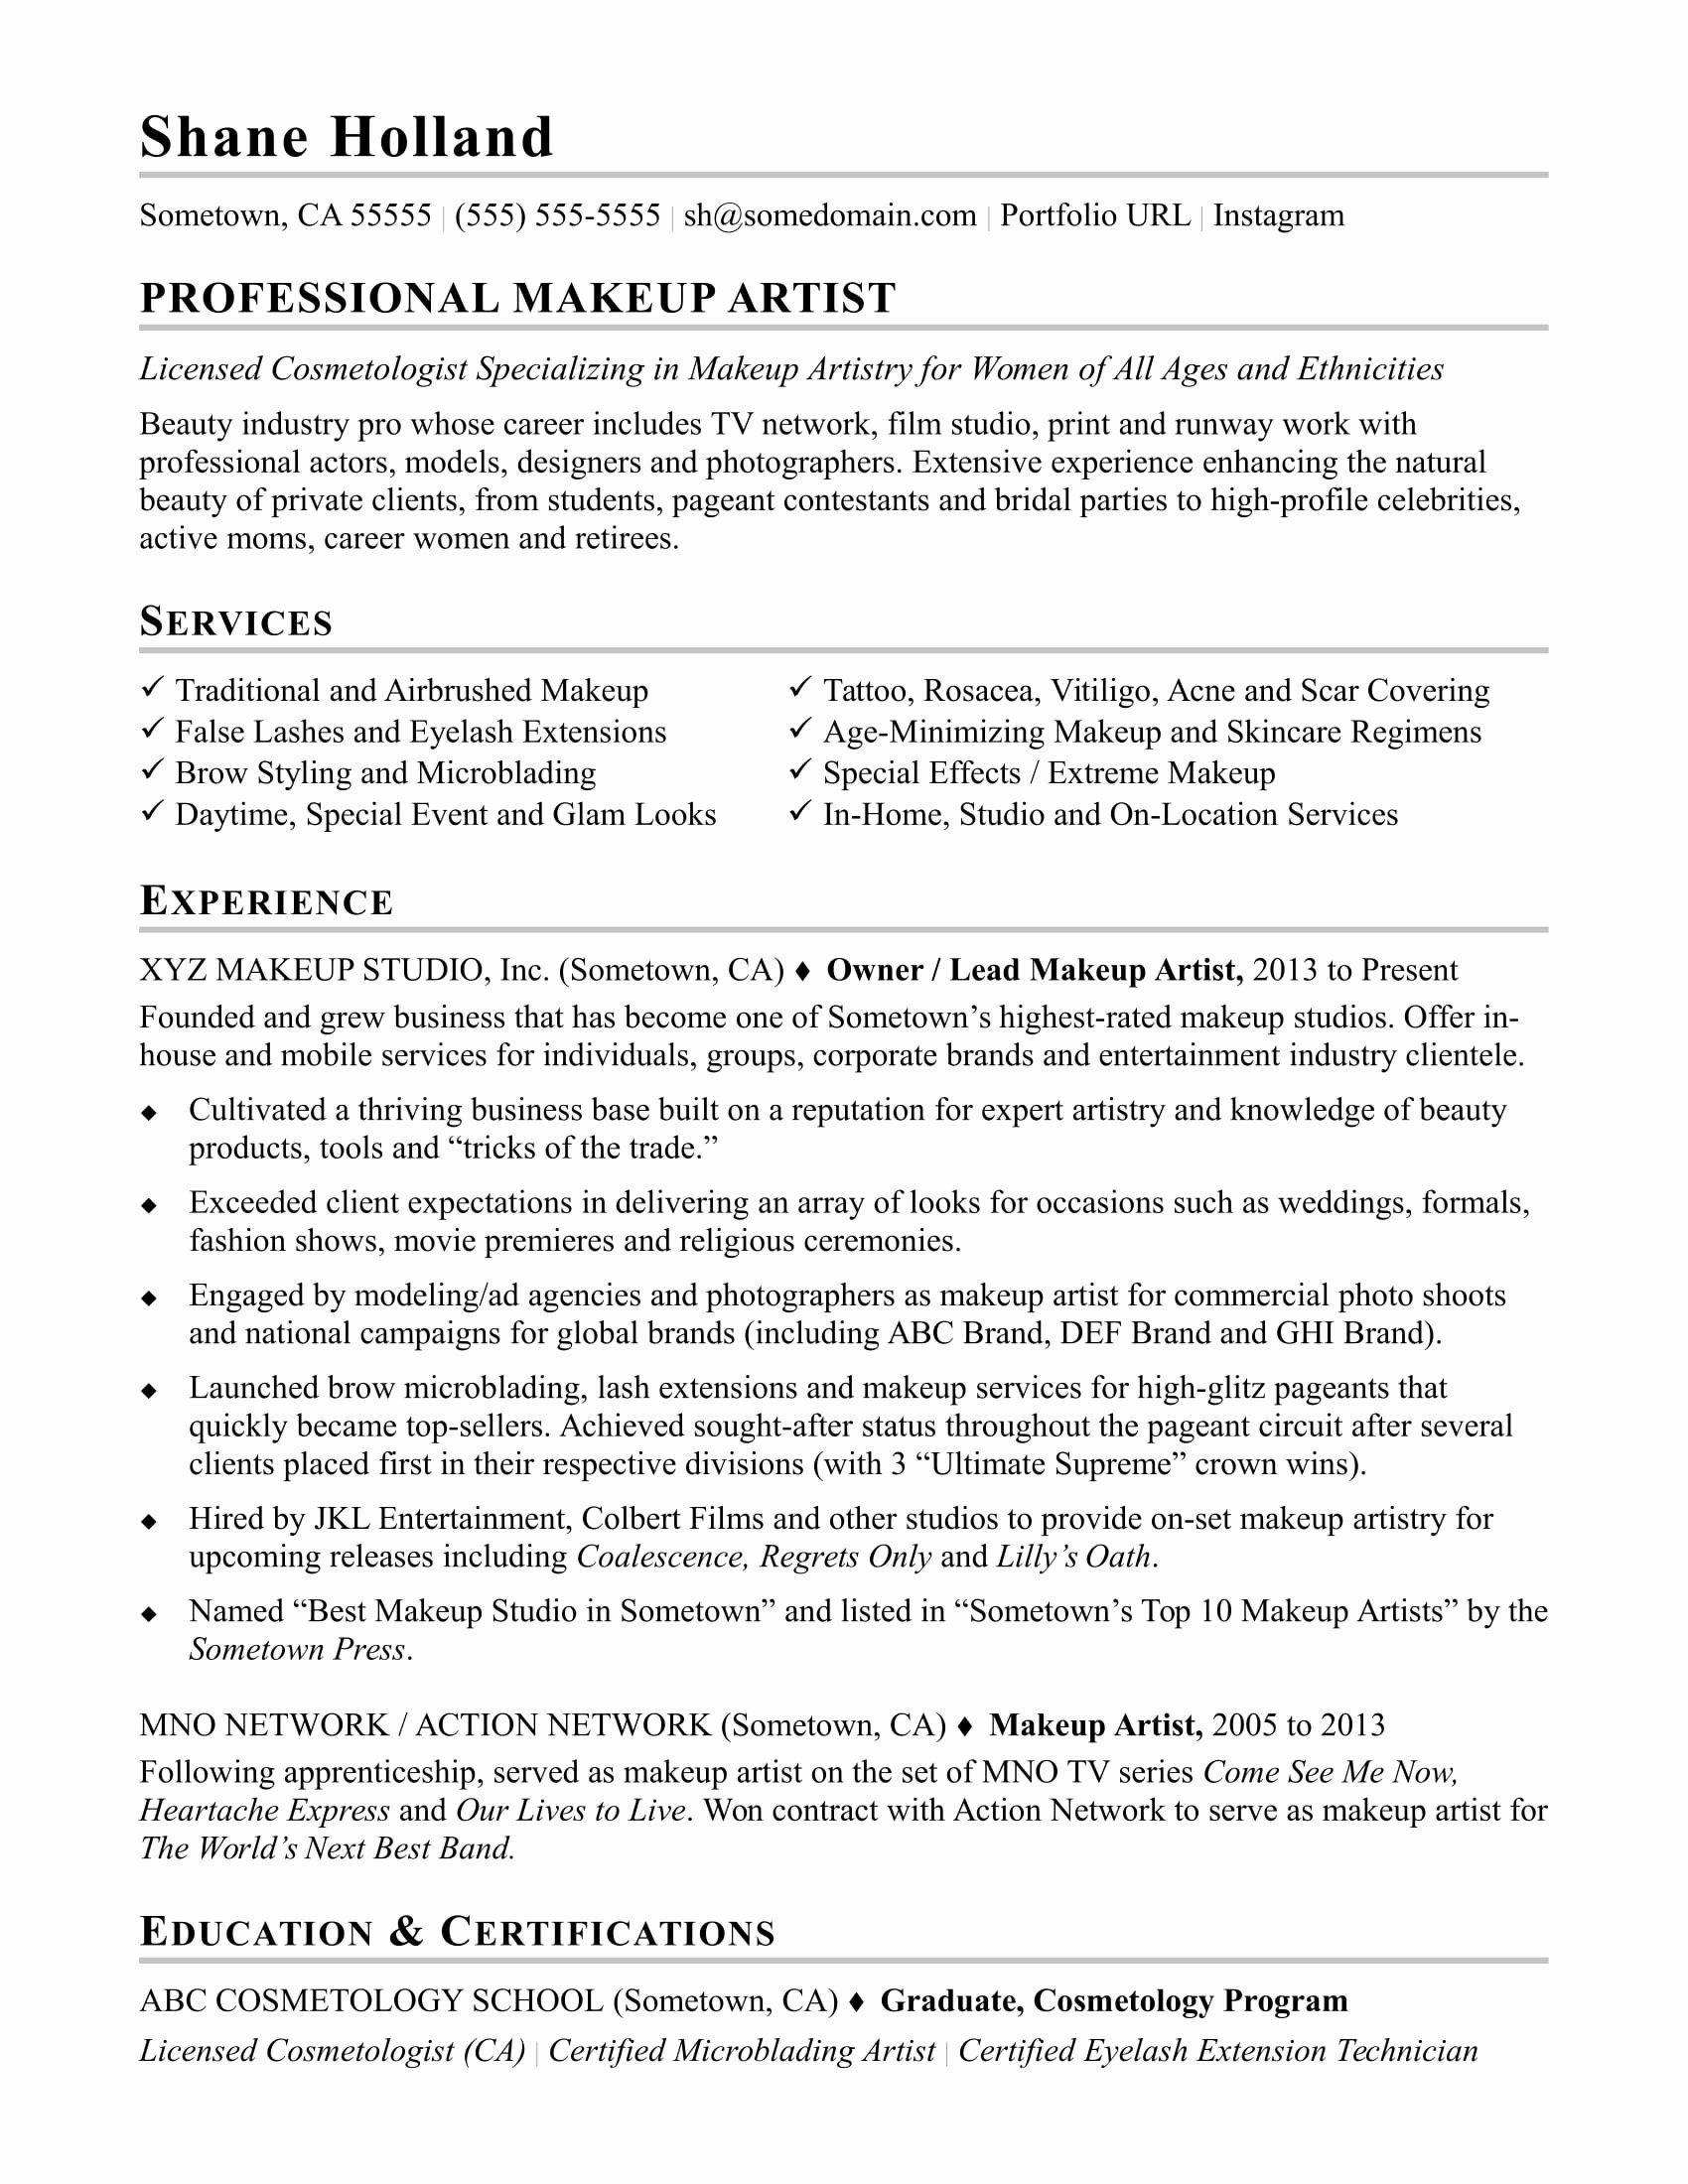 Beginner Makeup Artist Resume Luxury Makeup Artist Resume Sample Makeup Artist Resume Artist Resume Student Resume Template